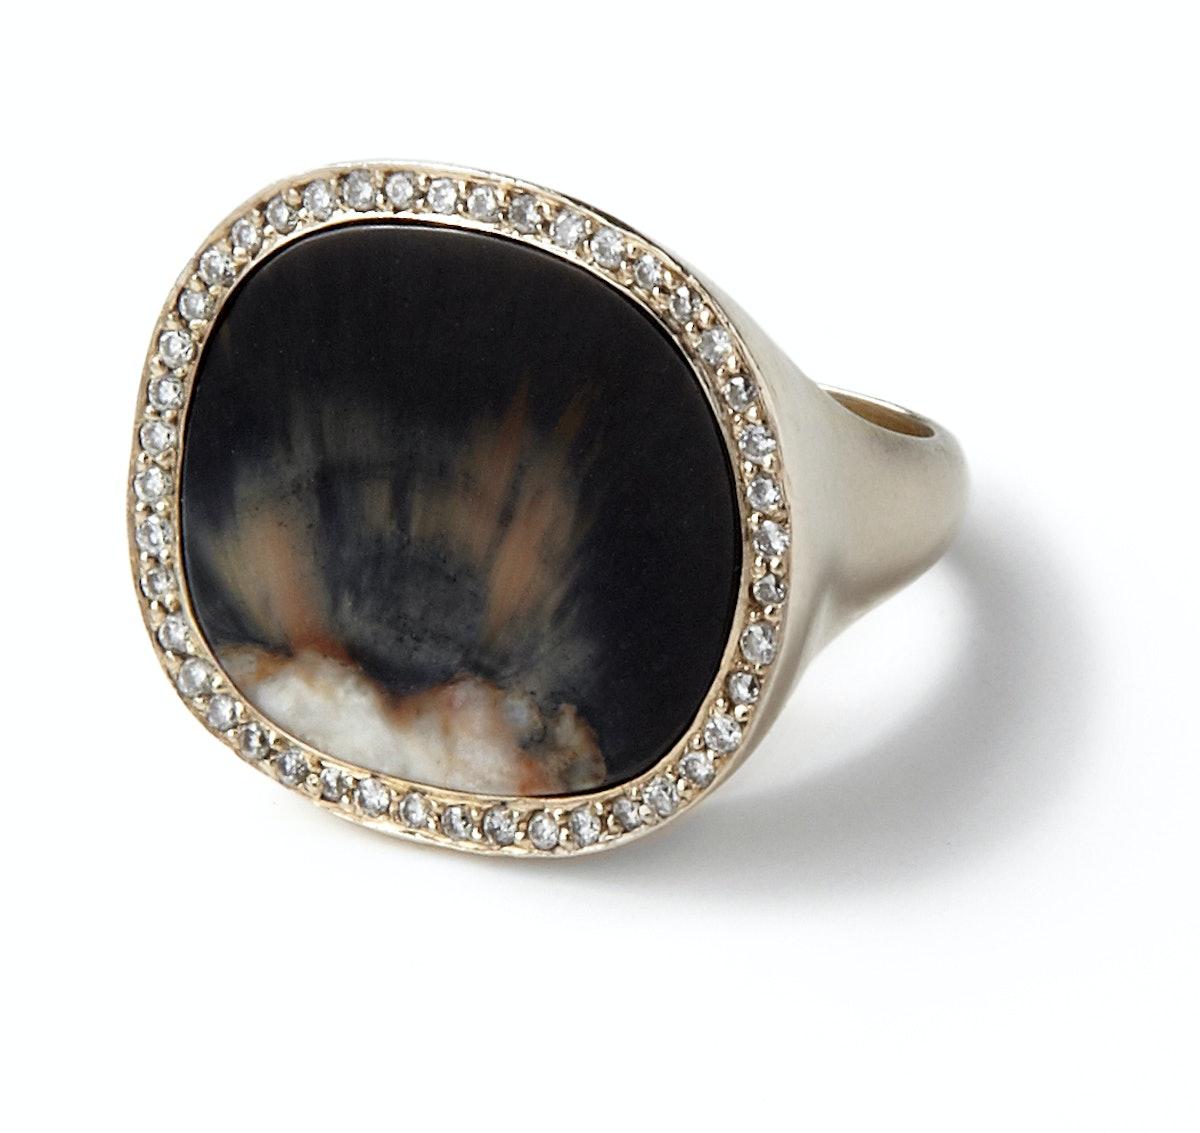 Monique Pean Pinky Ring